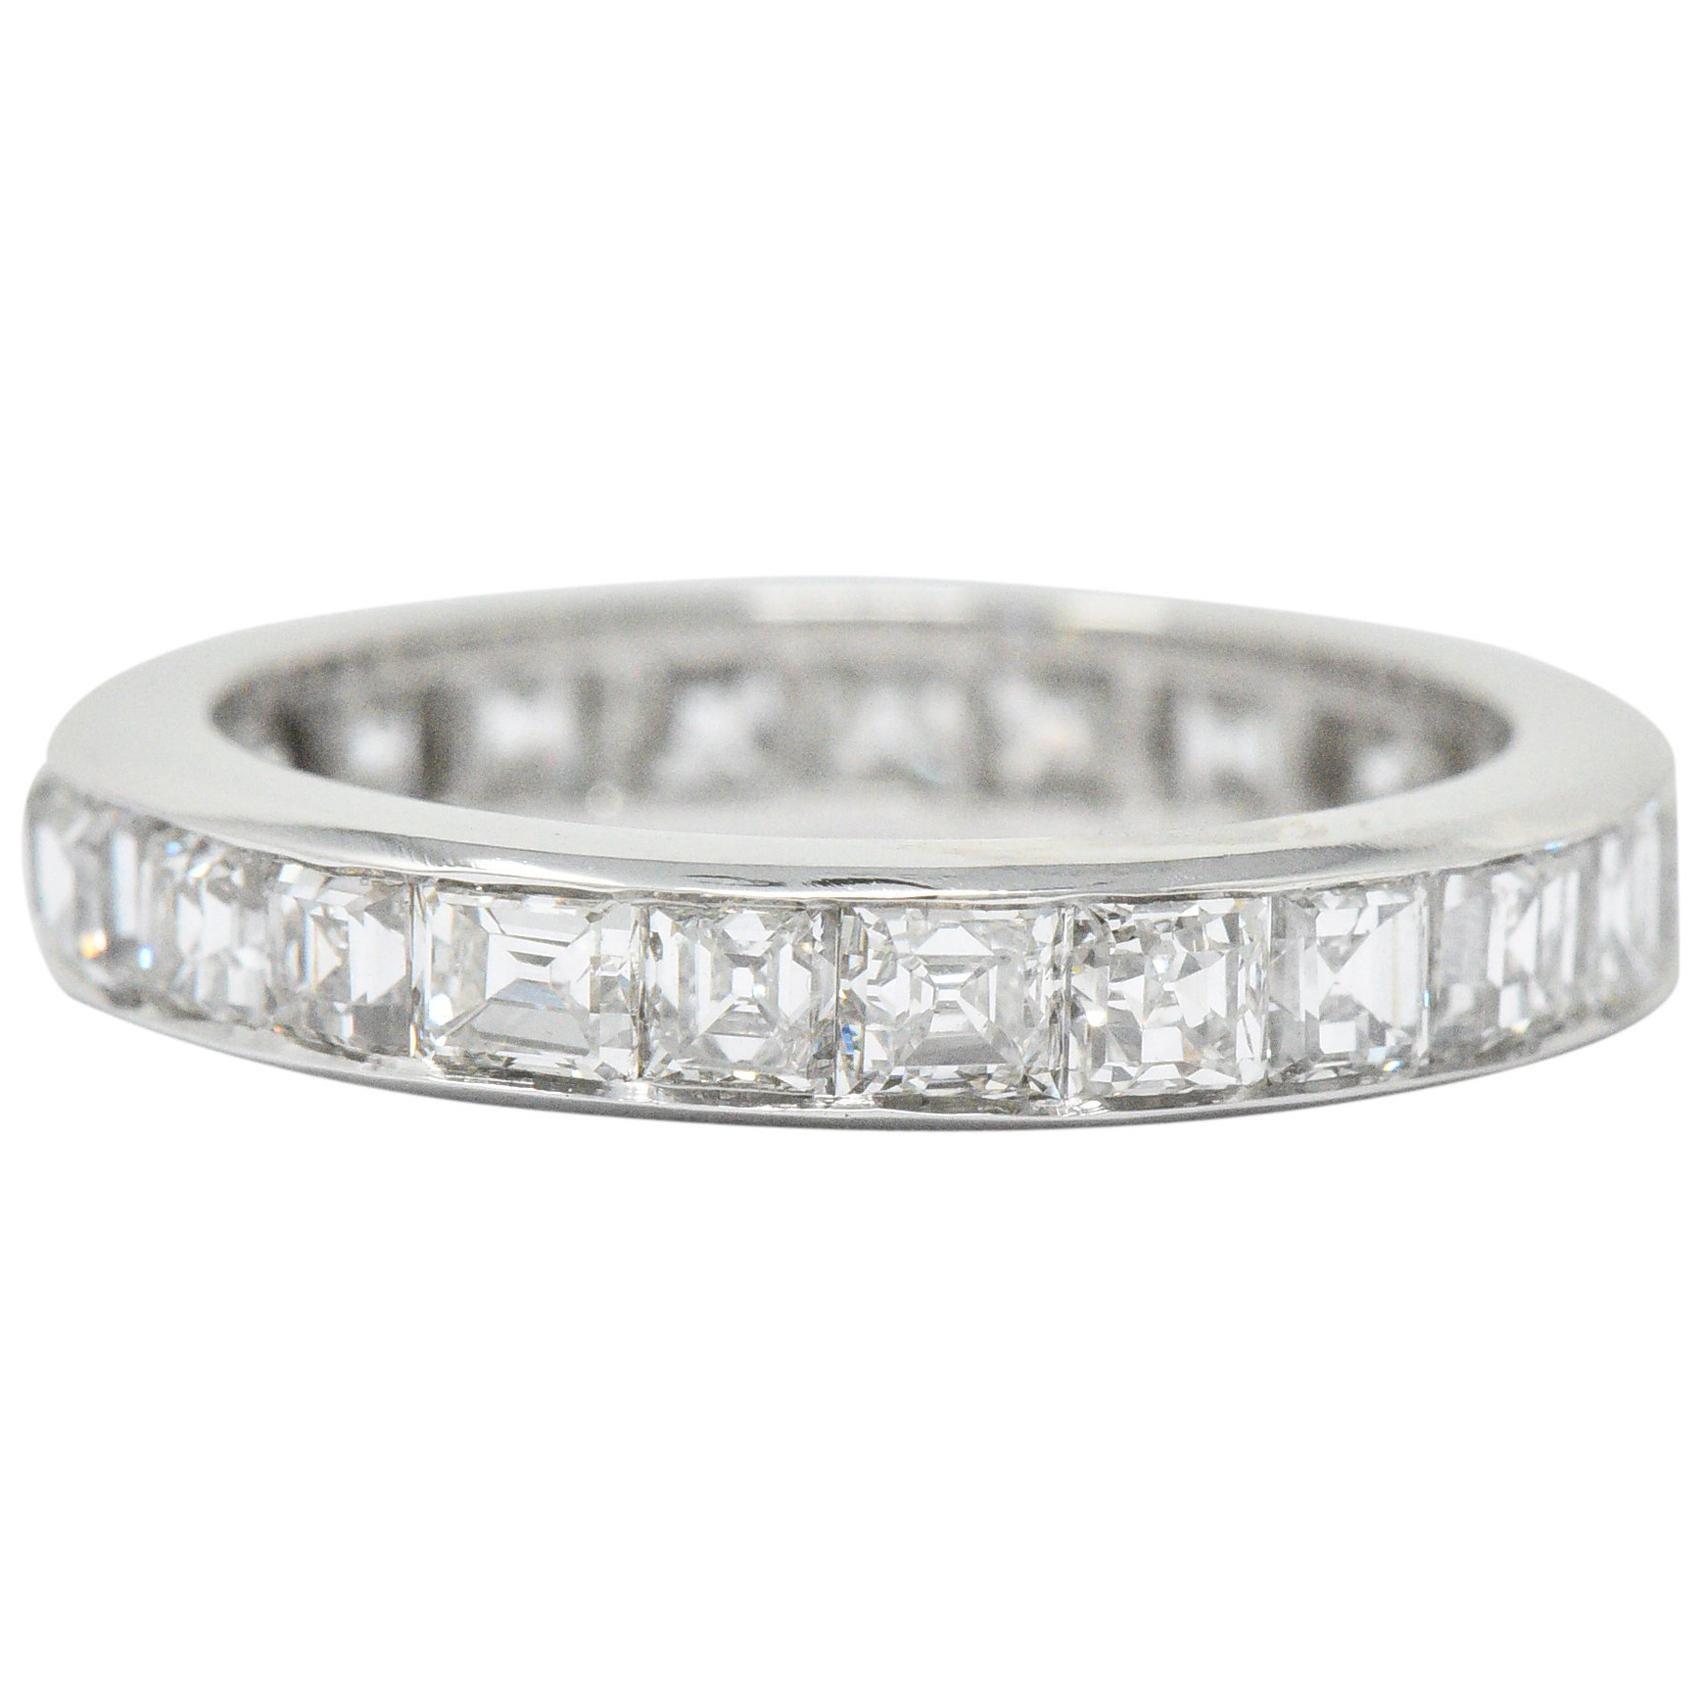 1950's Midcentury 4.14 Carats Asscher Diamond Platinum Eternity Band Ring